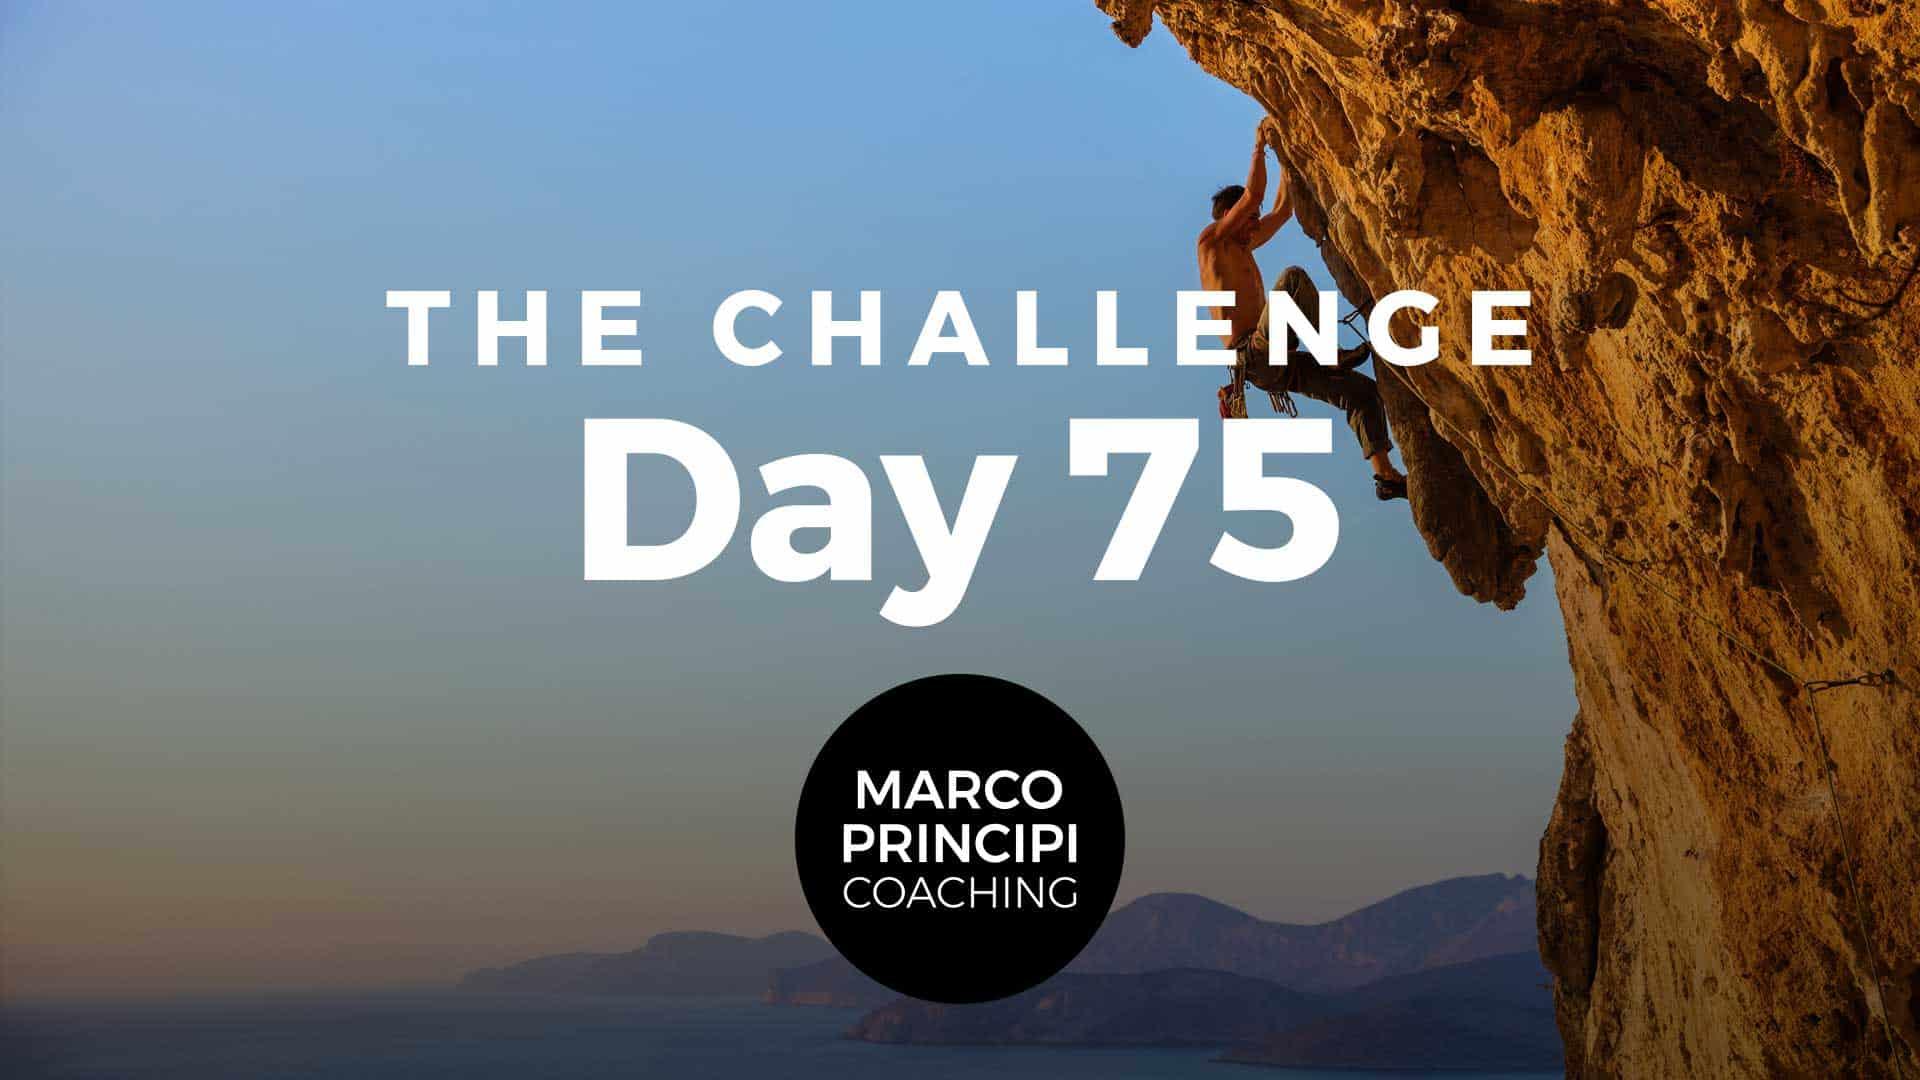 Marco Principi Coaching Challenge Day 75